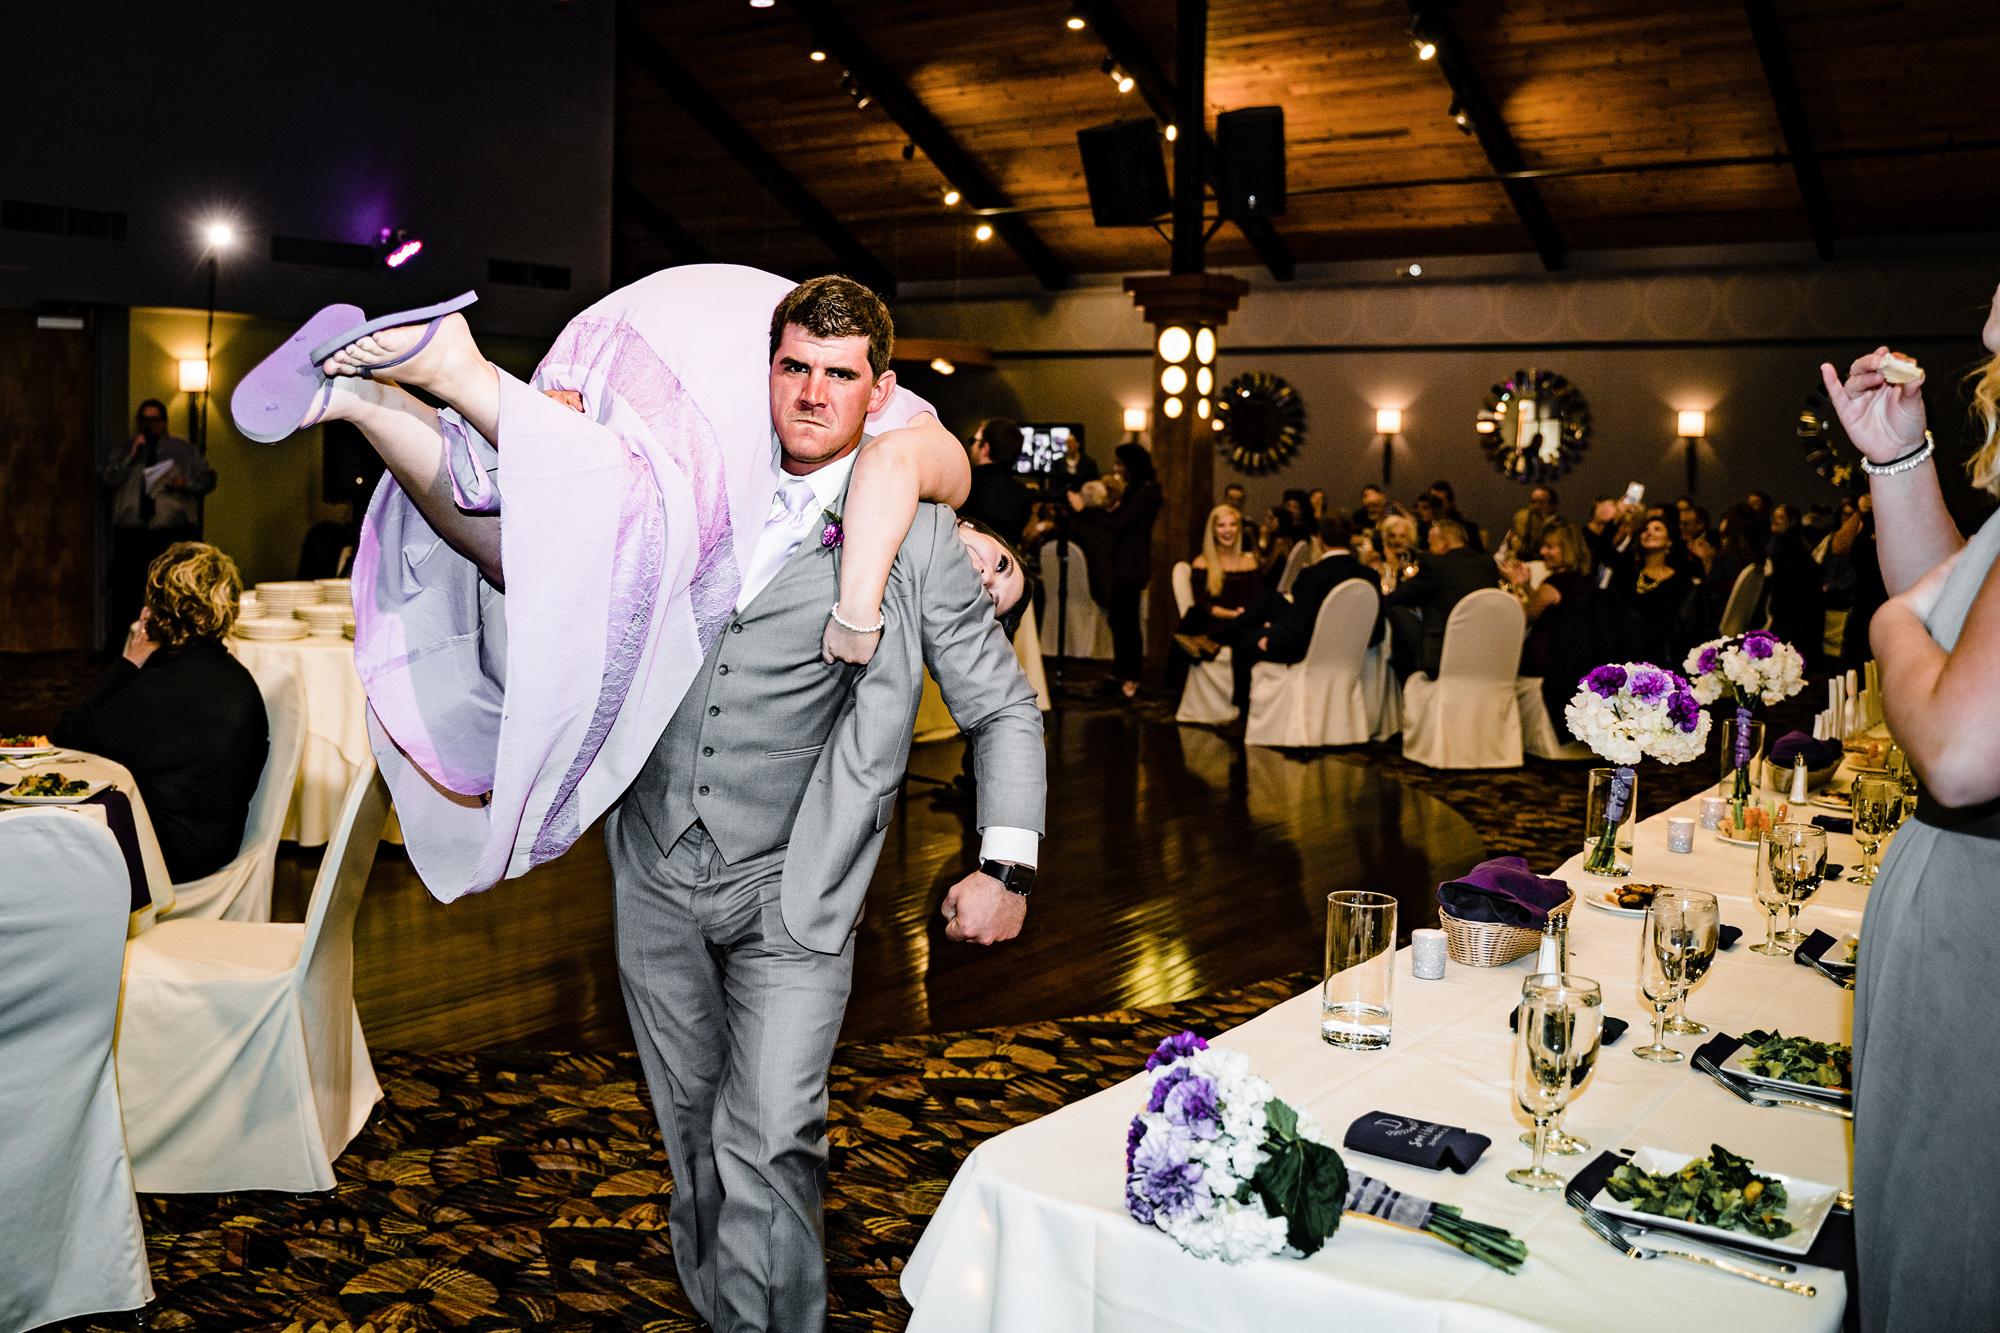 The-Pinnacle-Ballroom-Covington-KY-Wedding-Photography-12.jpg